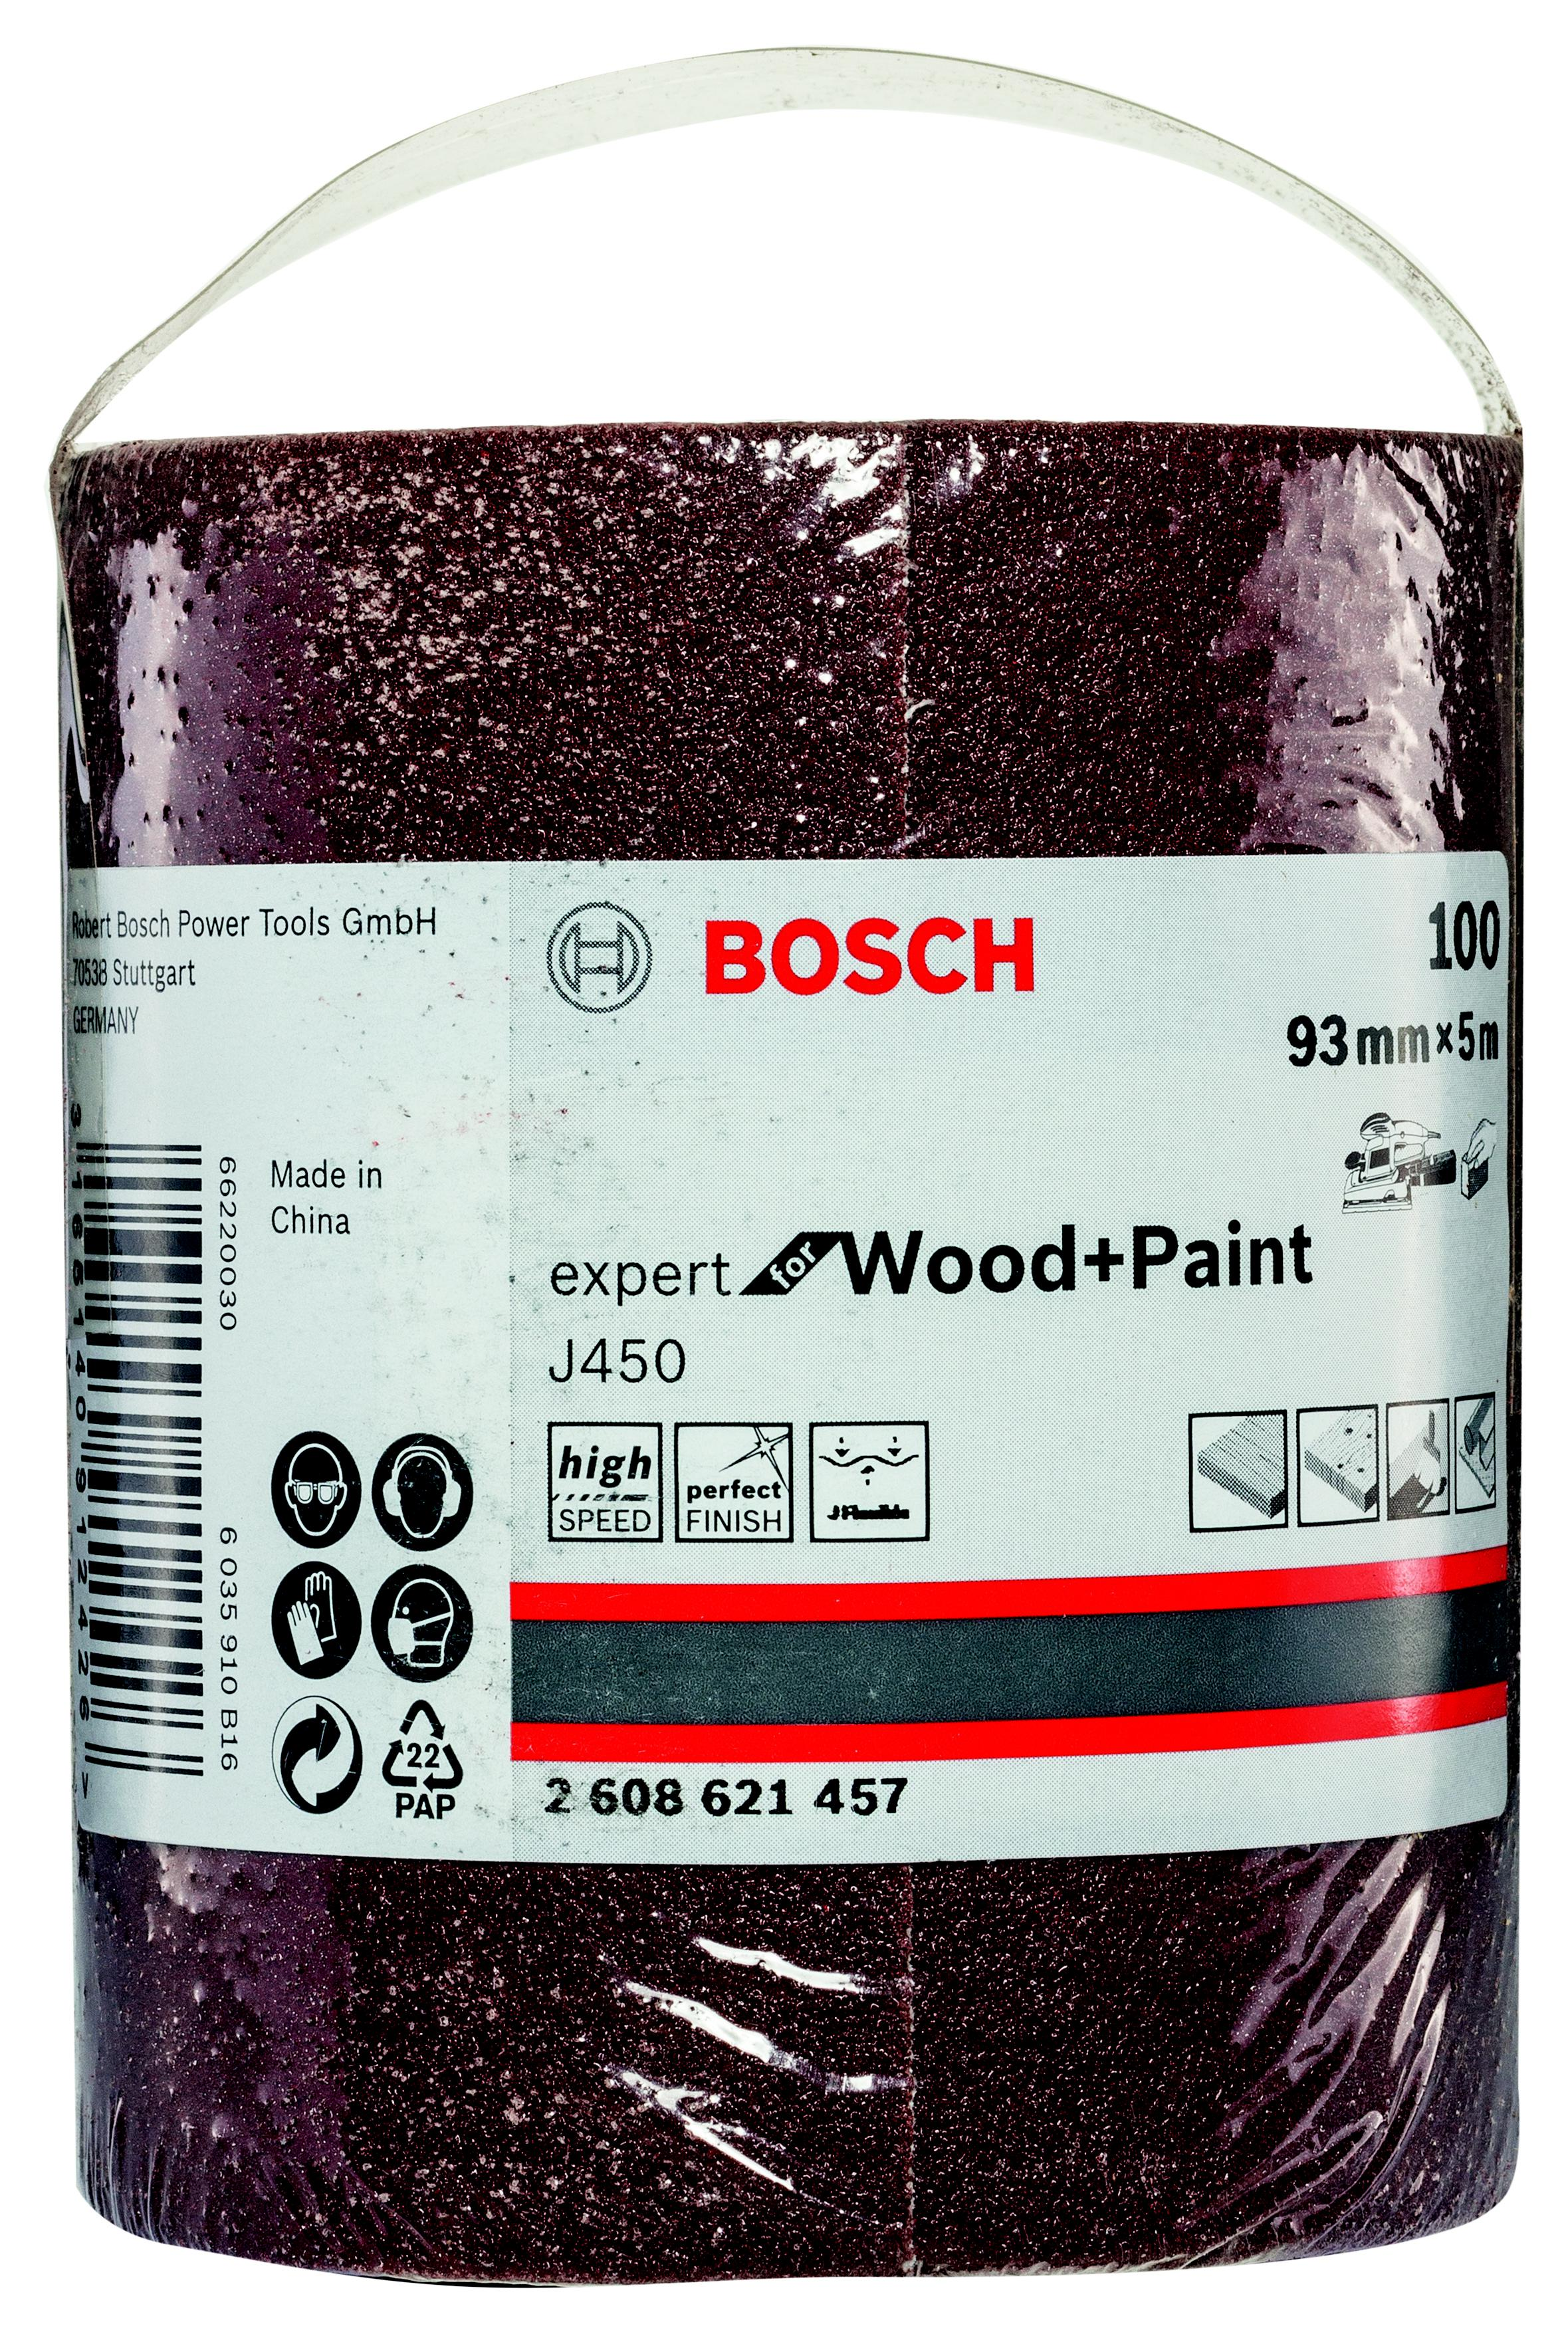 Шкурка шлифовальная в рулоне Bosch 93x5000 мм g100 (2.608.621.457)